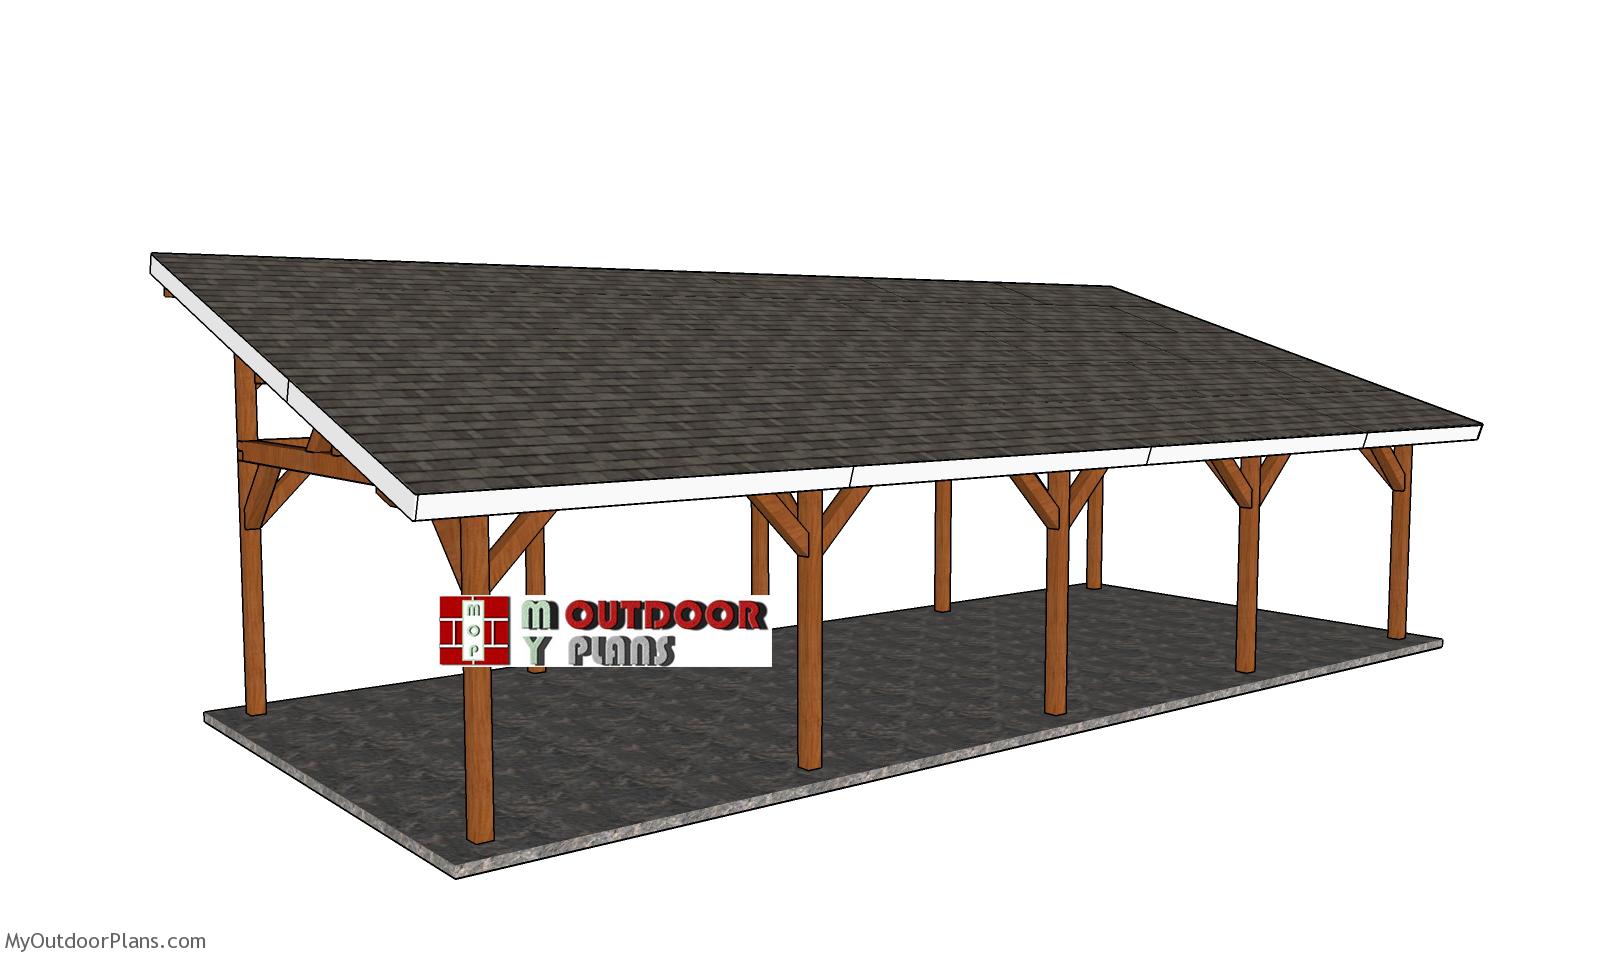 16x40 Lean to Pavilion Plans - Free DIY Tutorial